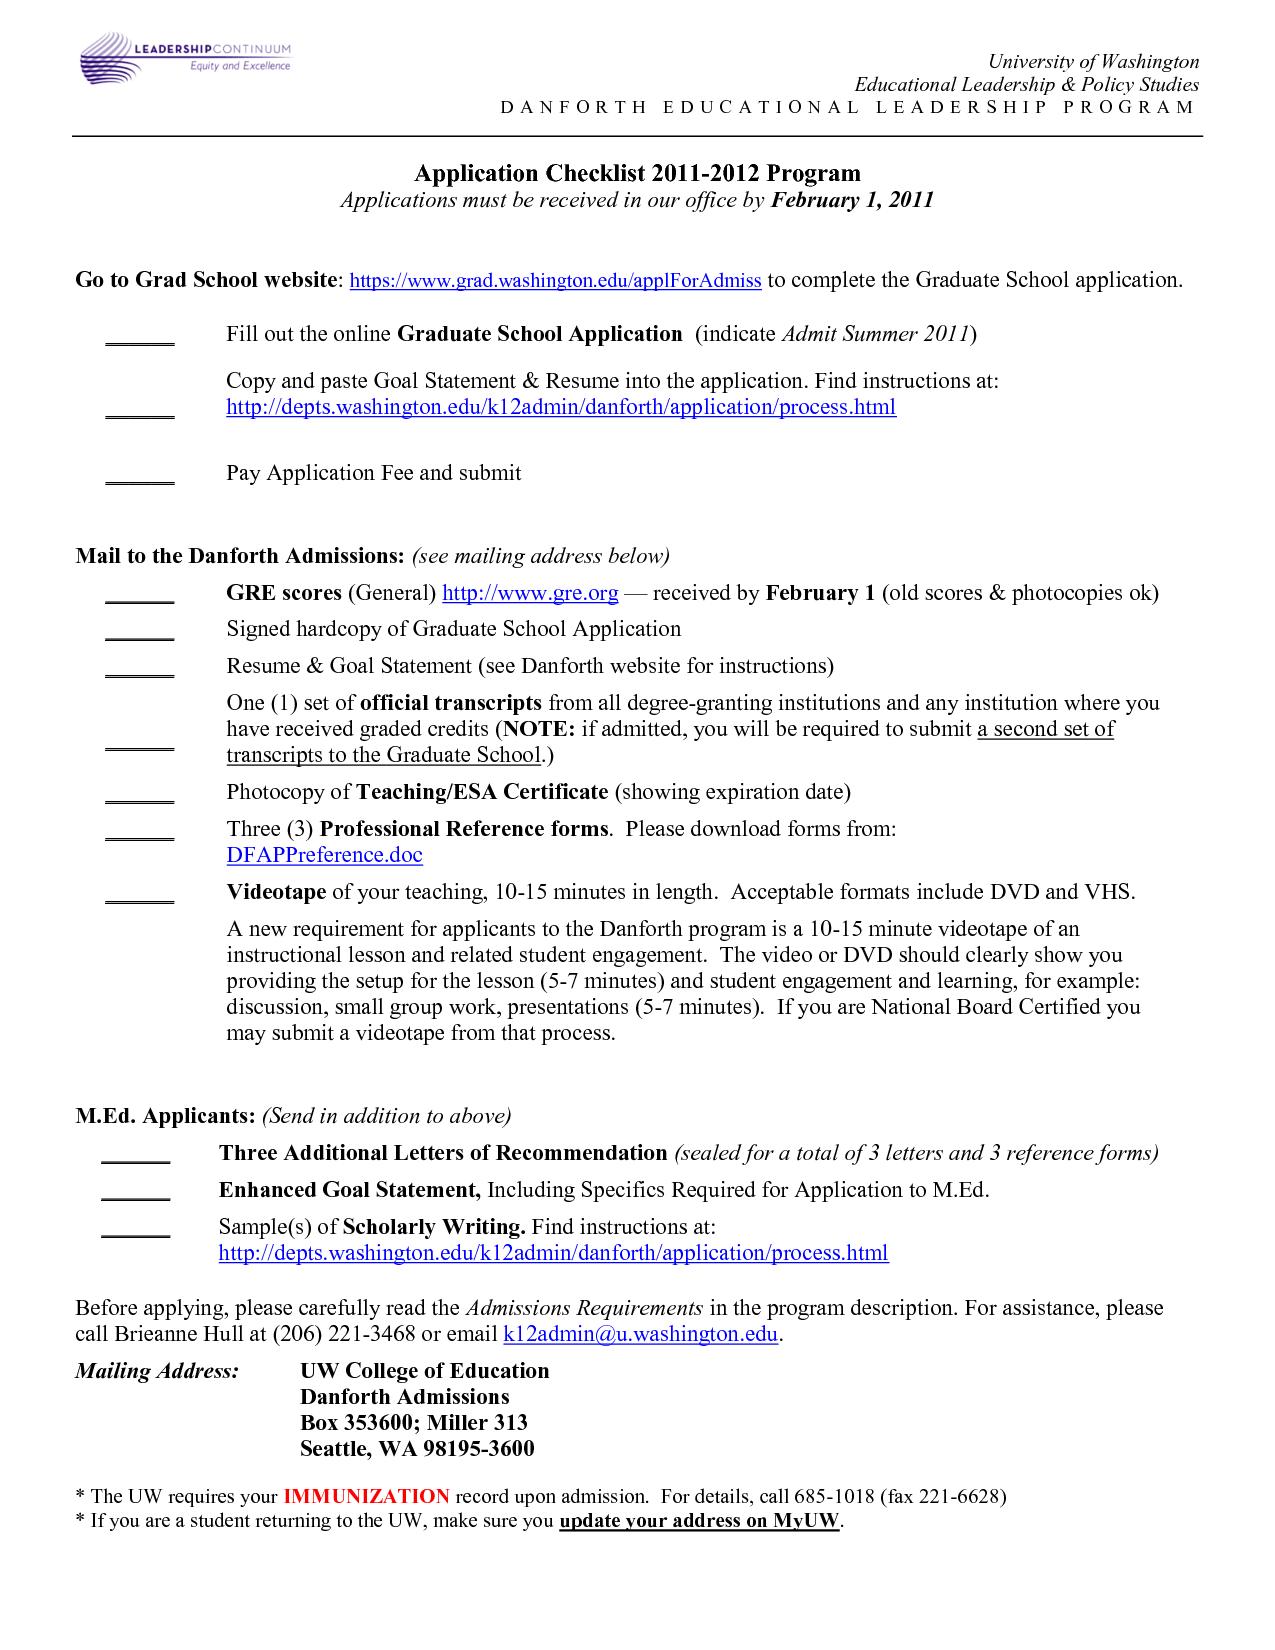 Graduate School Resume Format http//www.resumecareer